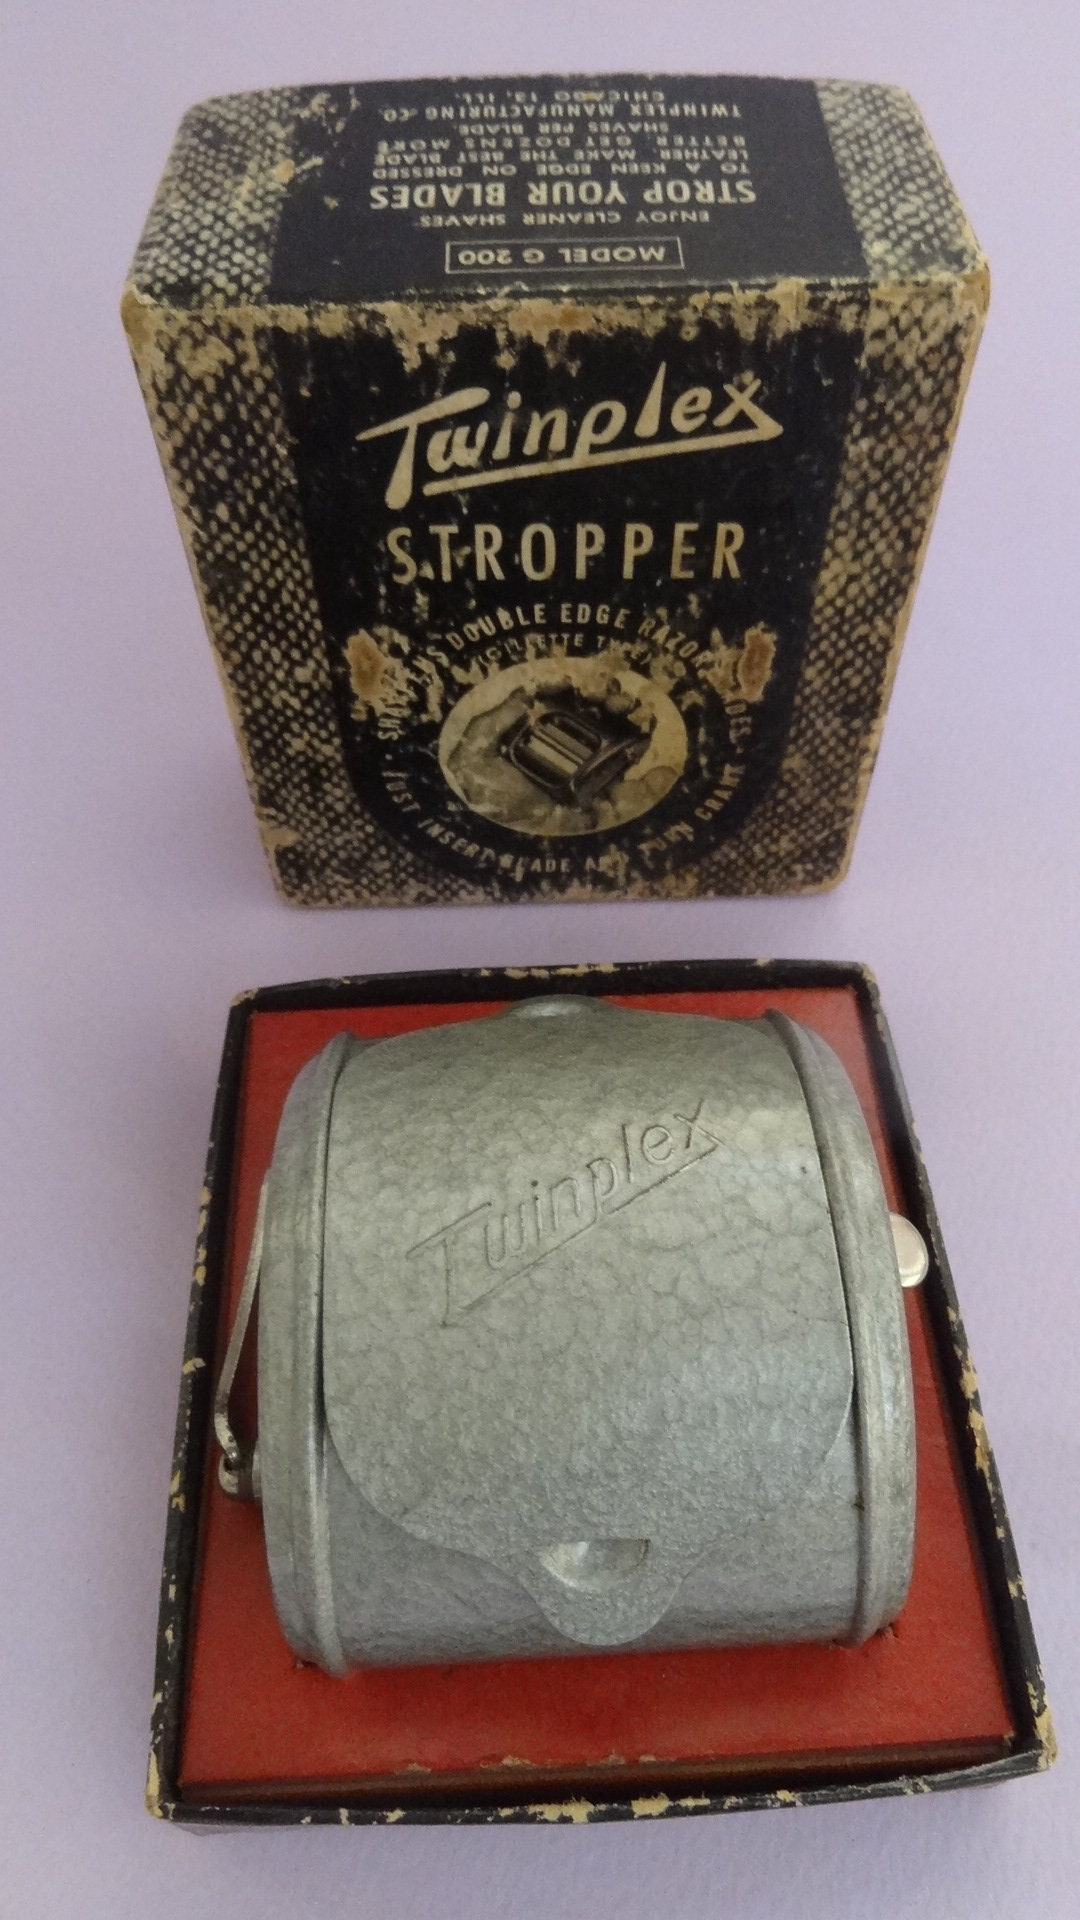 Vintage Razor BLADE SHARPENER 1950s, Twinplex Stropper Razor Blade  Sharpener in Original Box, USA Metal Razor Sharpener, Men's Shaving Set